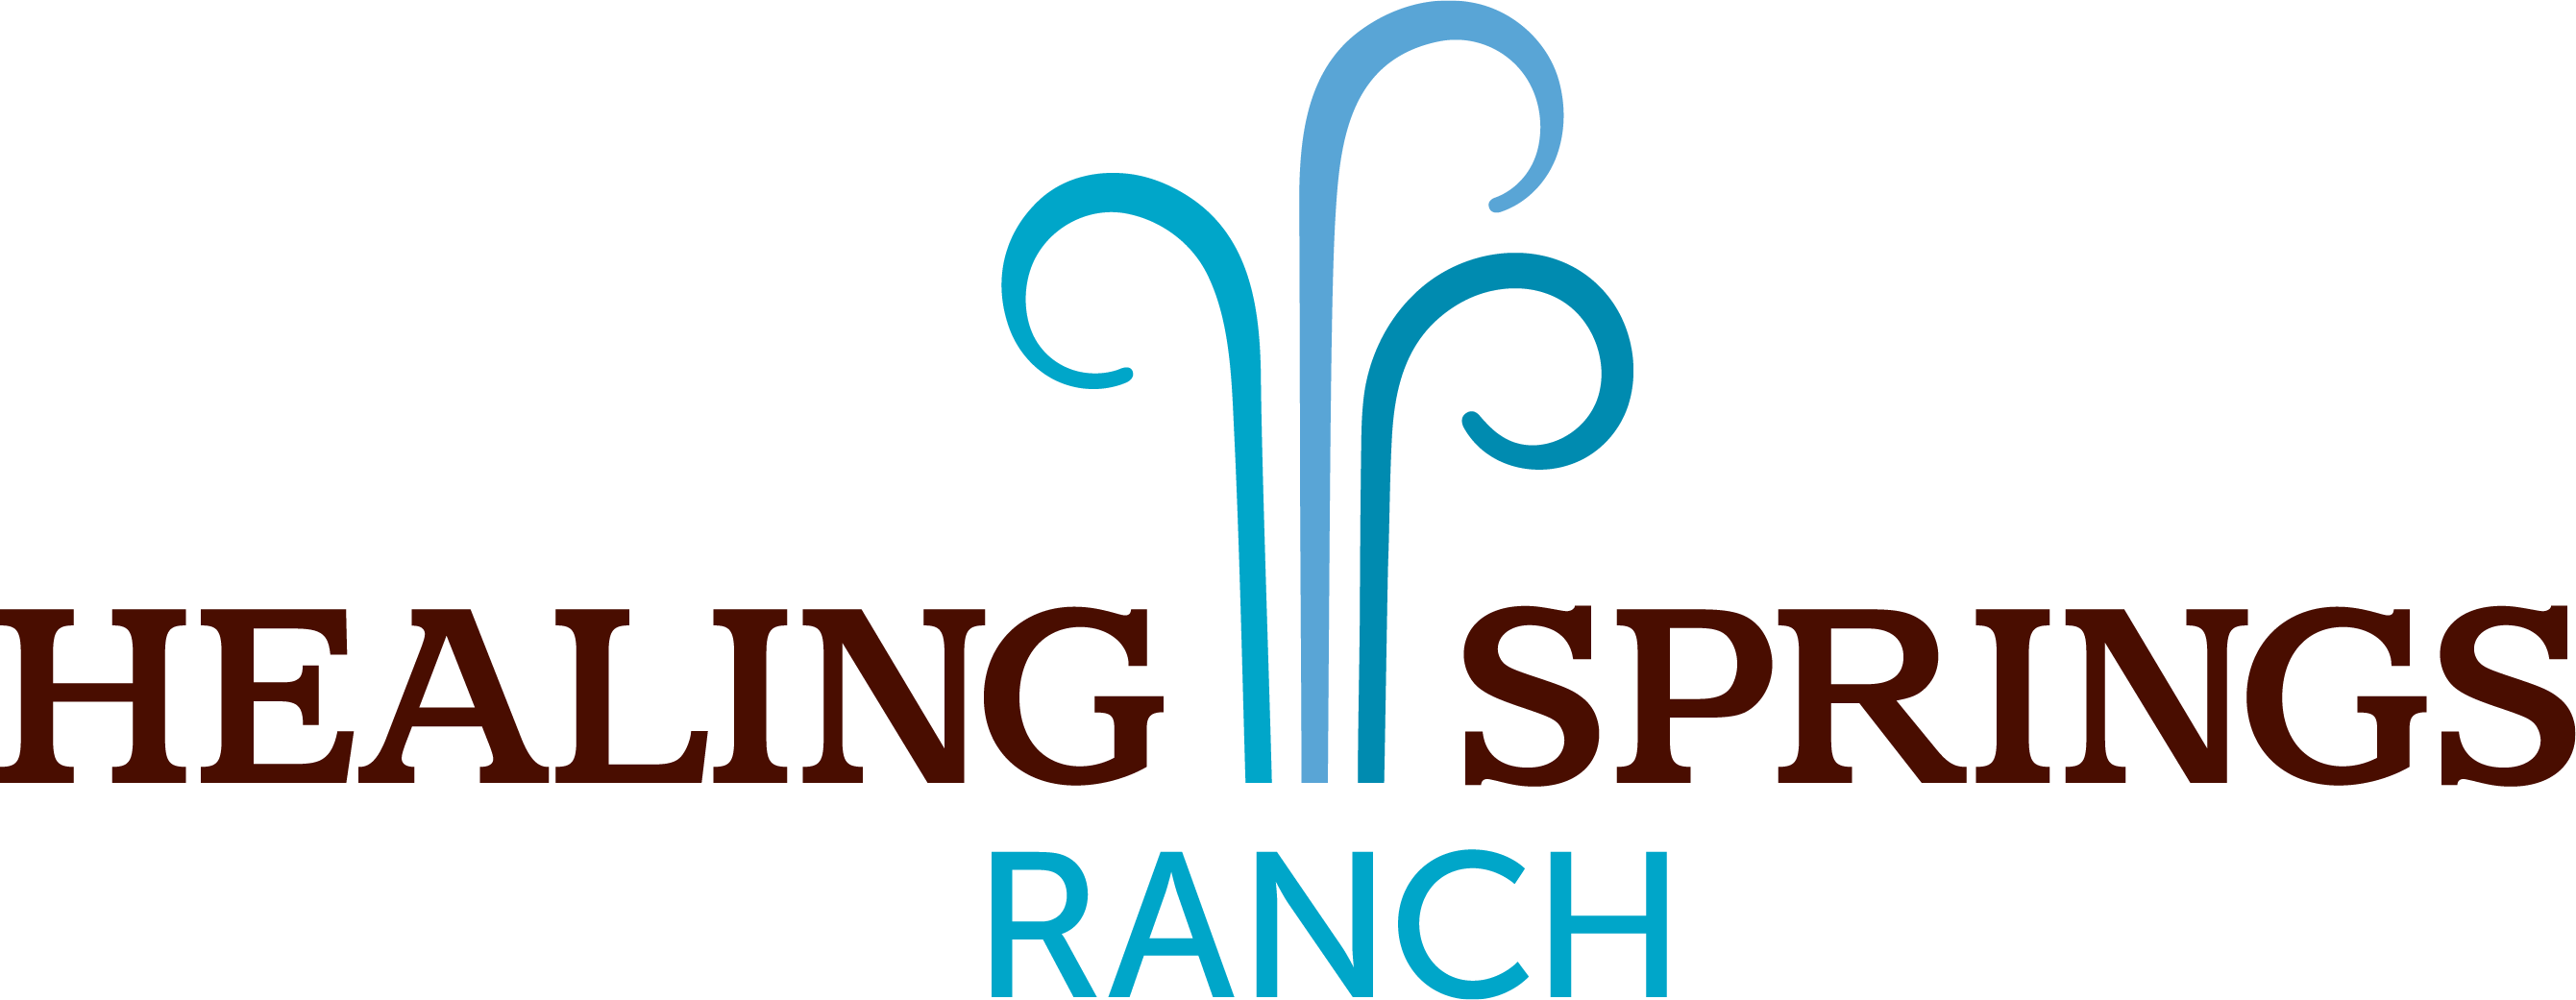 Healing Springs Ranch